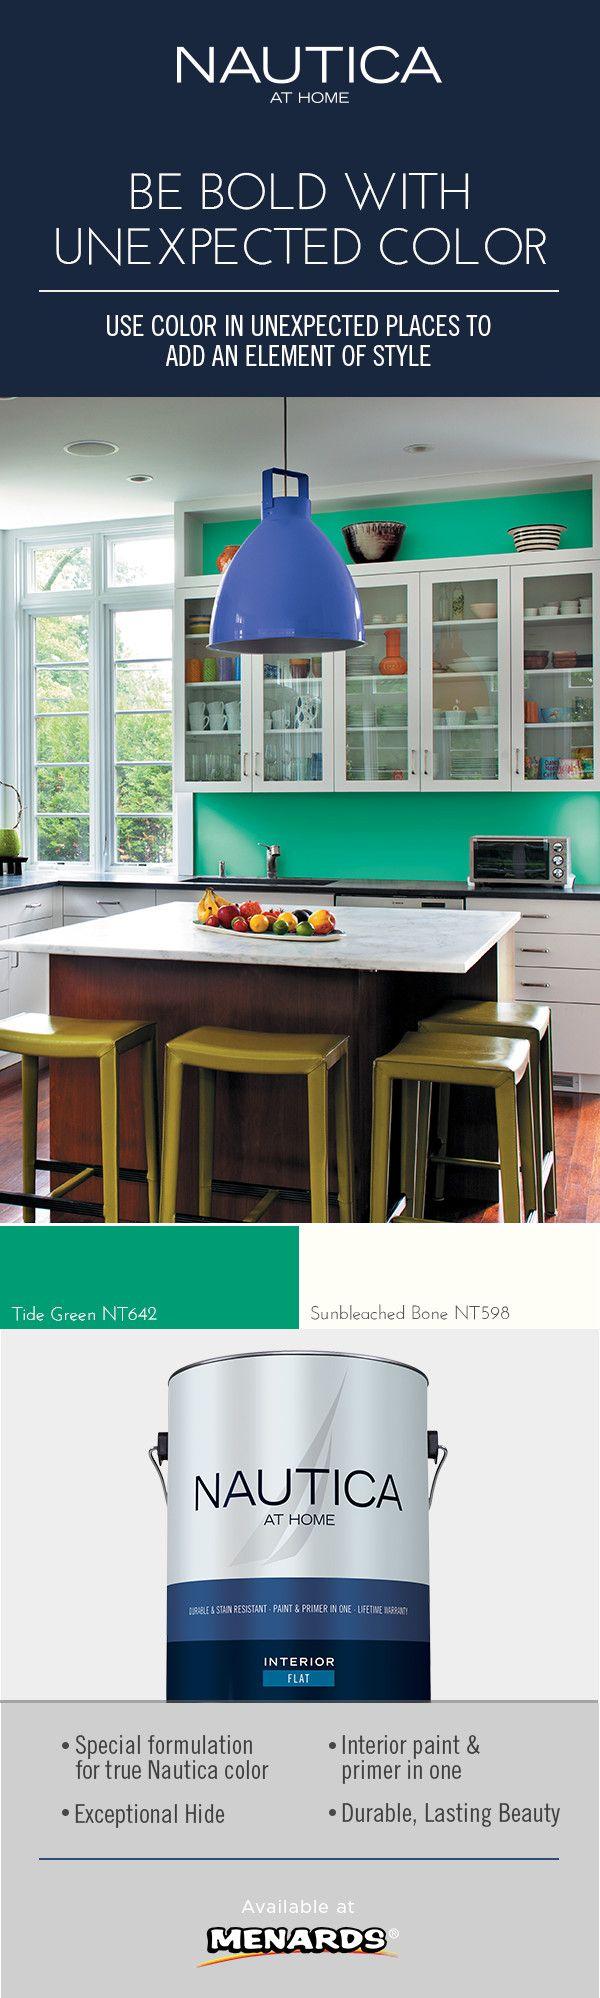 Fancy Menards Kitchens Ornament - Modern Kitchen Set - dietmania.info